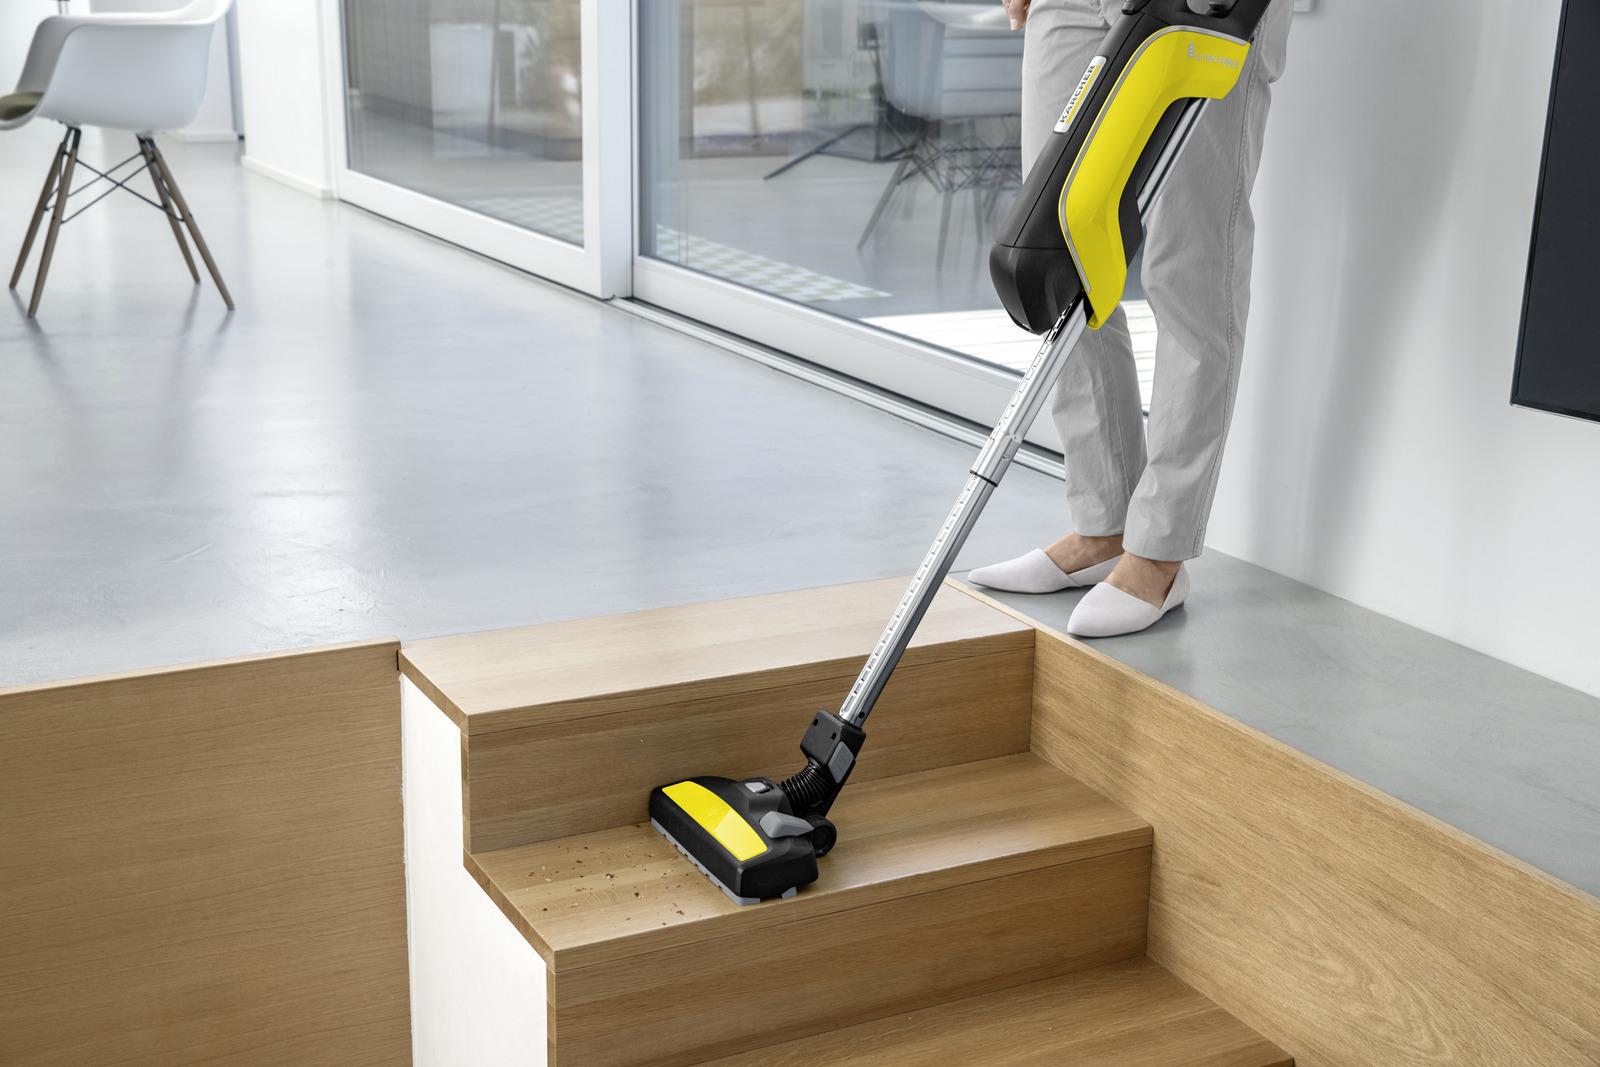 aspirateur balai vc 5 sans fil k rcher. Black Bedroom Furniture Sets. Home Design Ideas